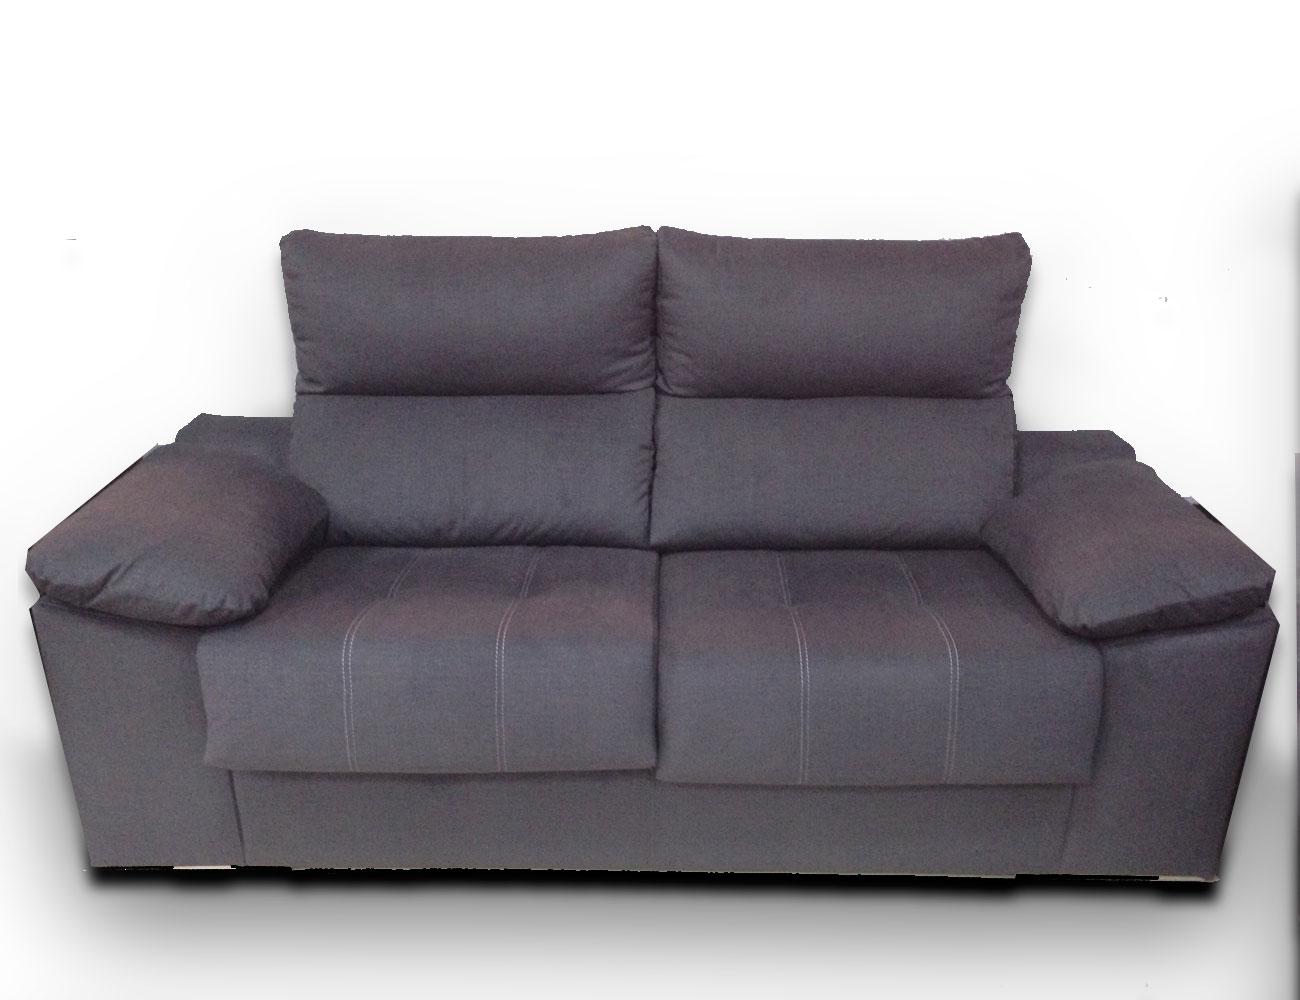 Sofa 3 plazas6